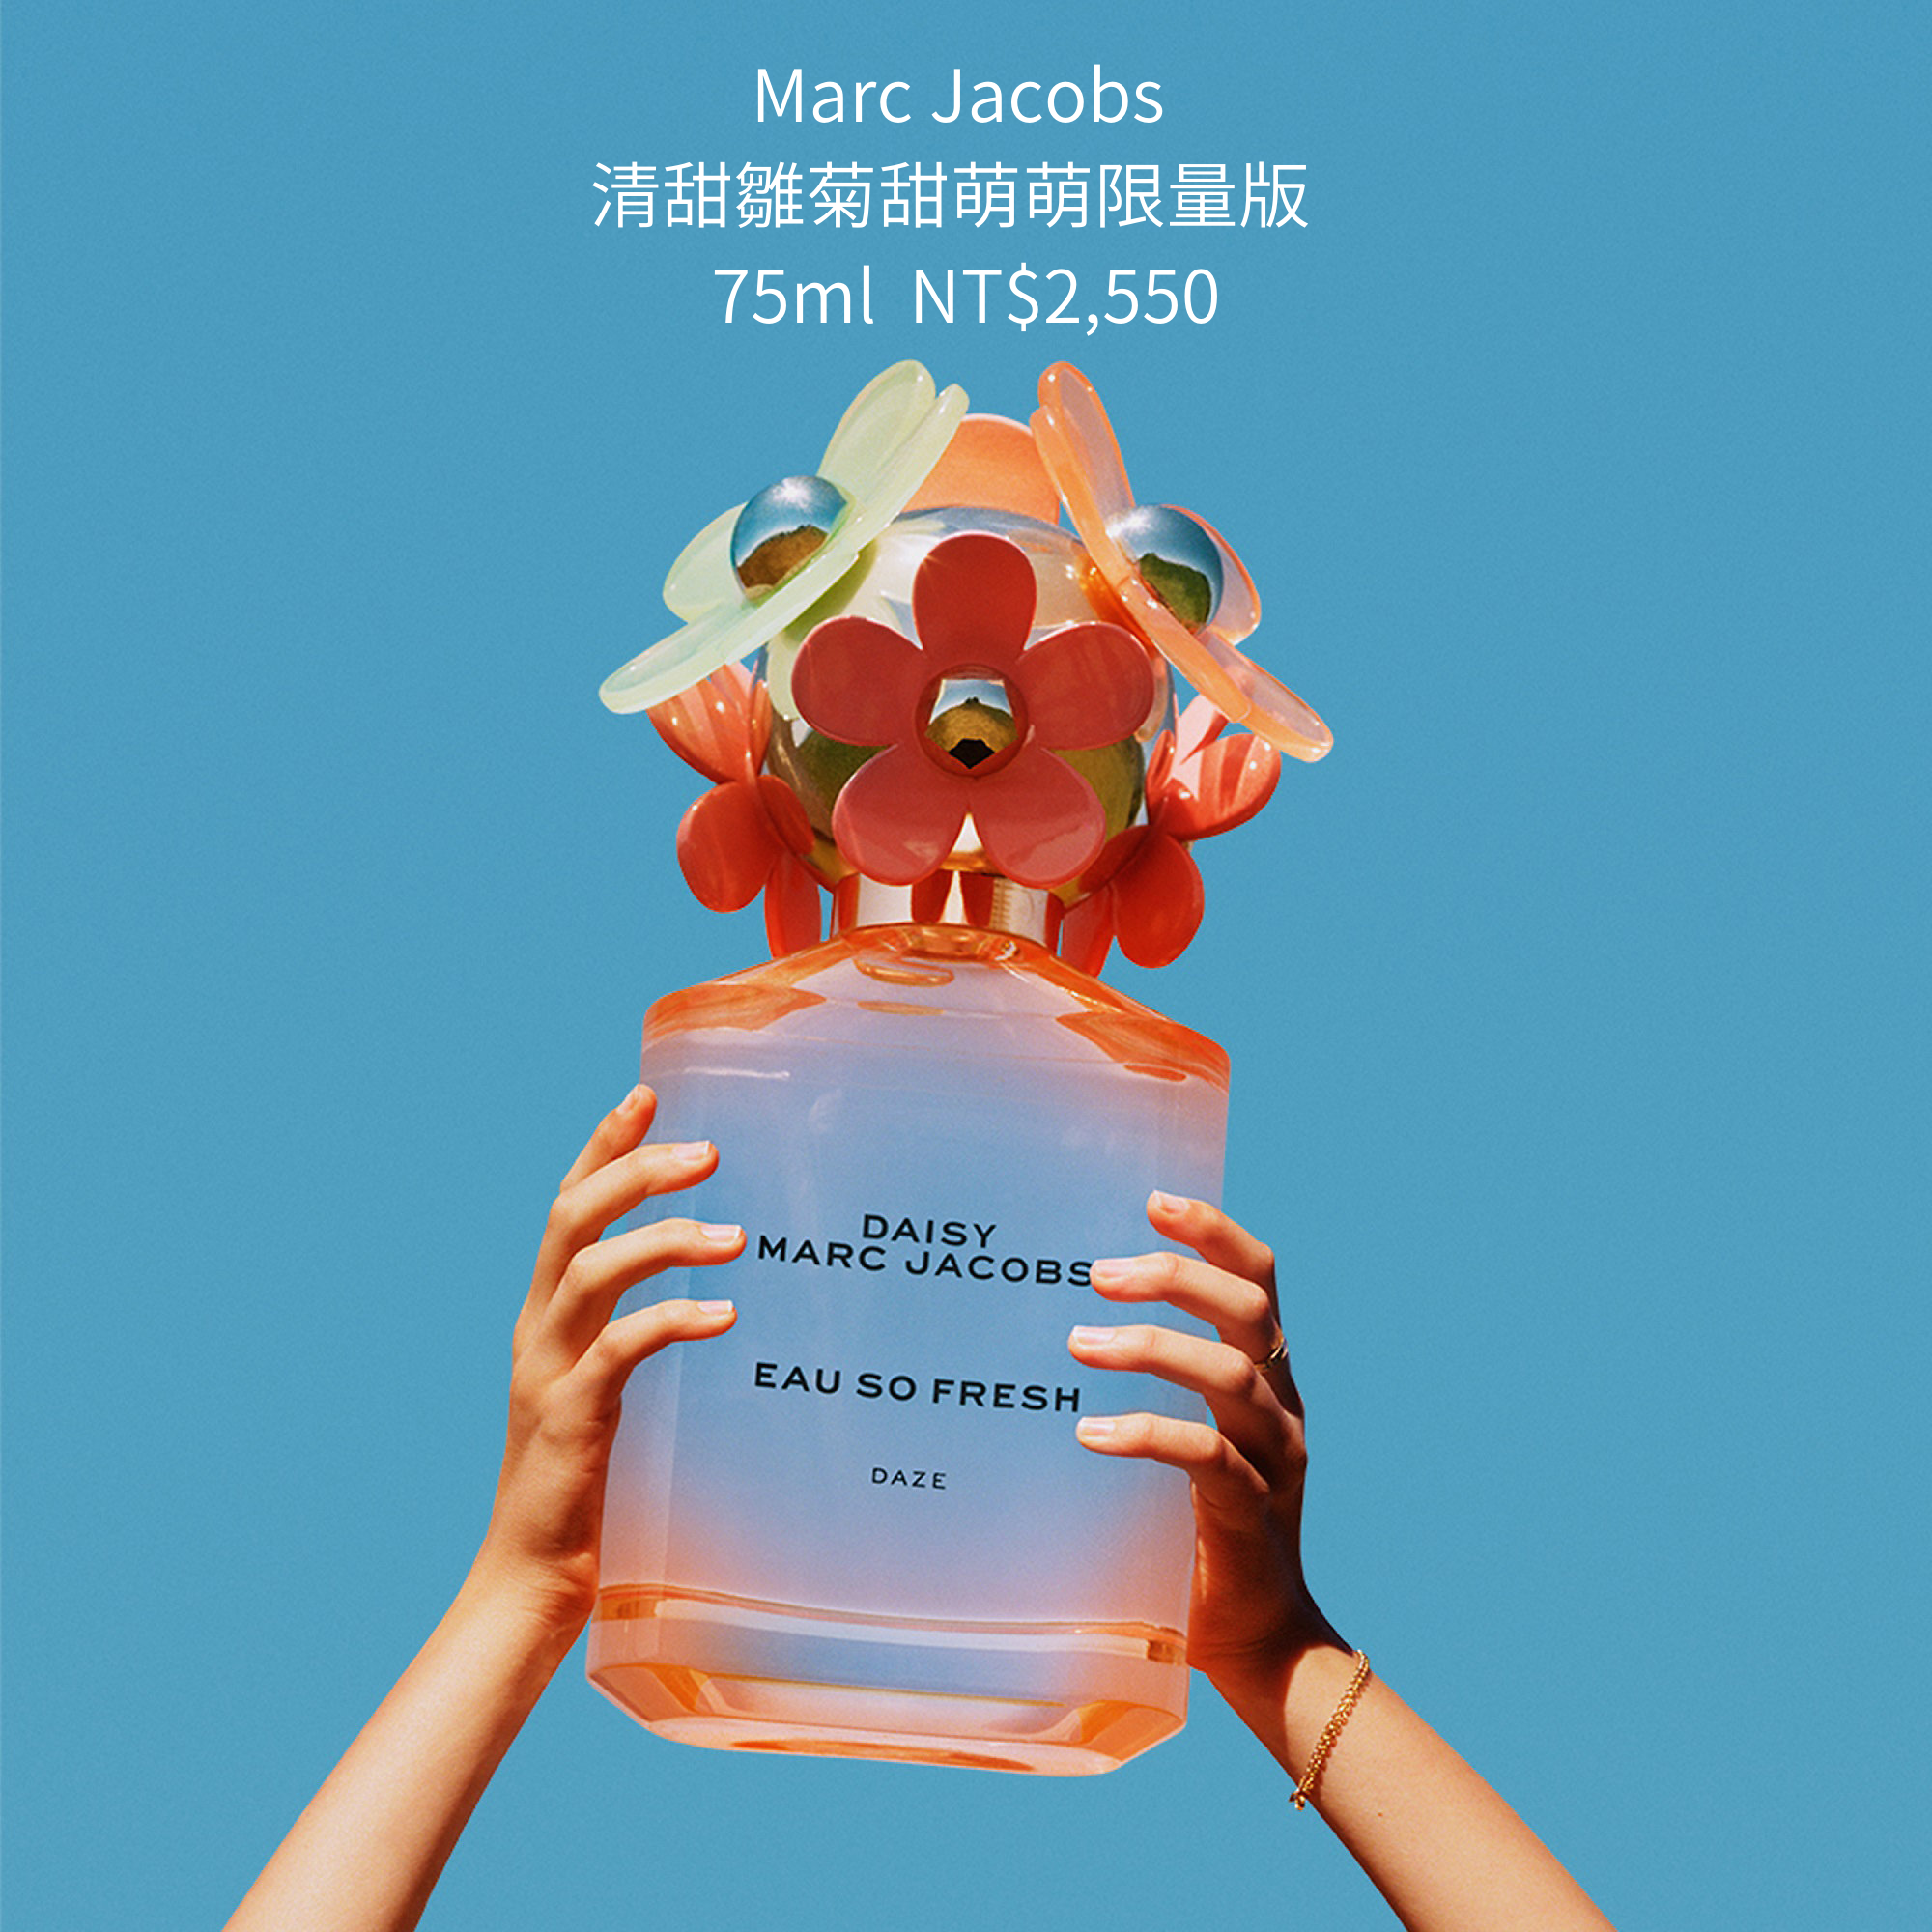 Marc Jacobs 清甜雛菊甜萌萌限量版 75ml NT$2,550